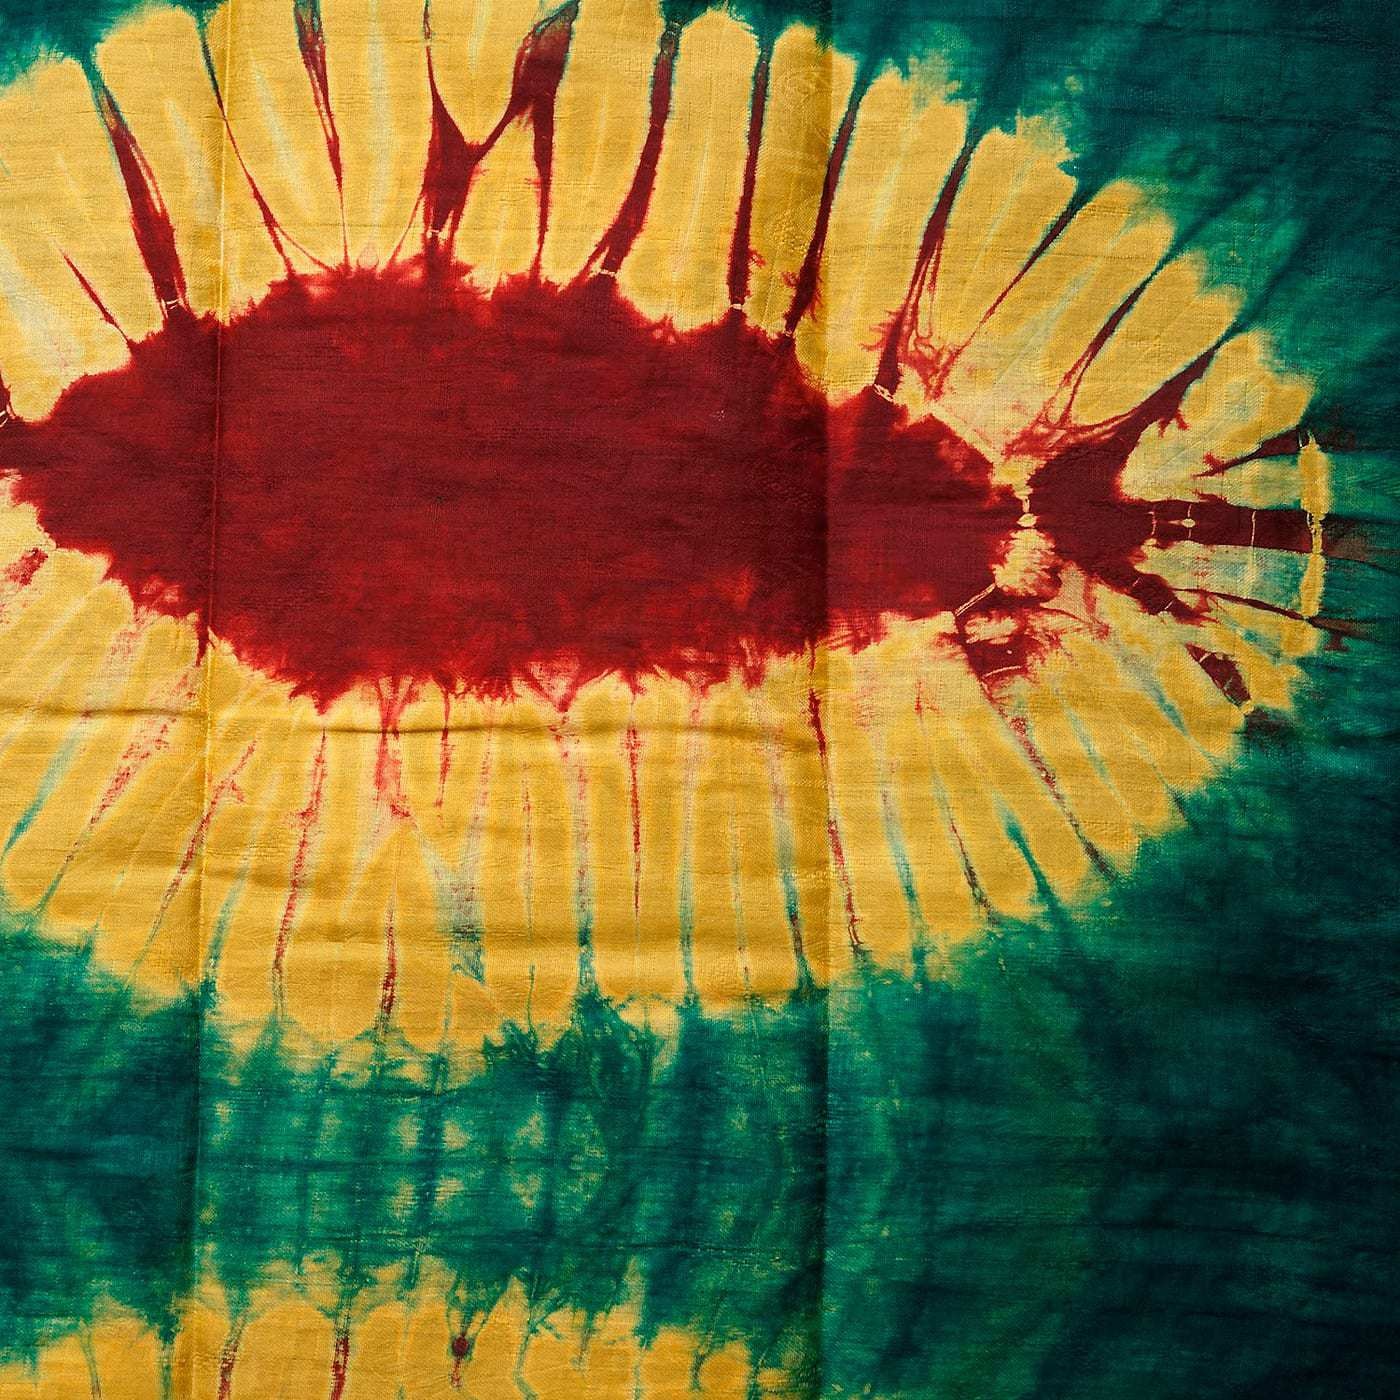 Leroy Merlin Teinture Textile 100+ [ teinture rouge vetement ] | byjohanna fath